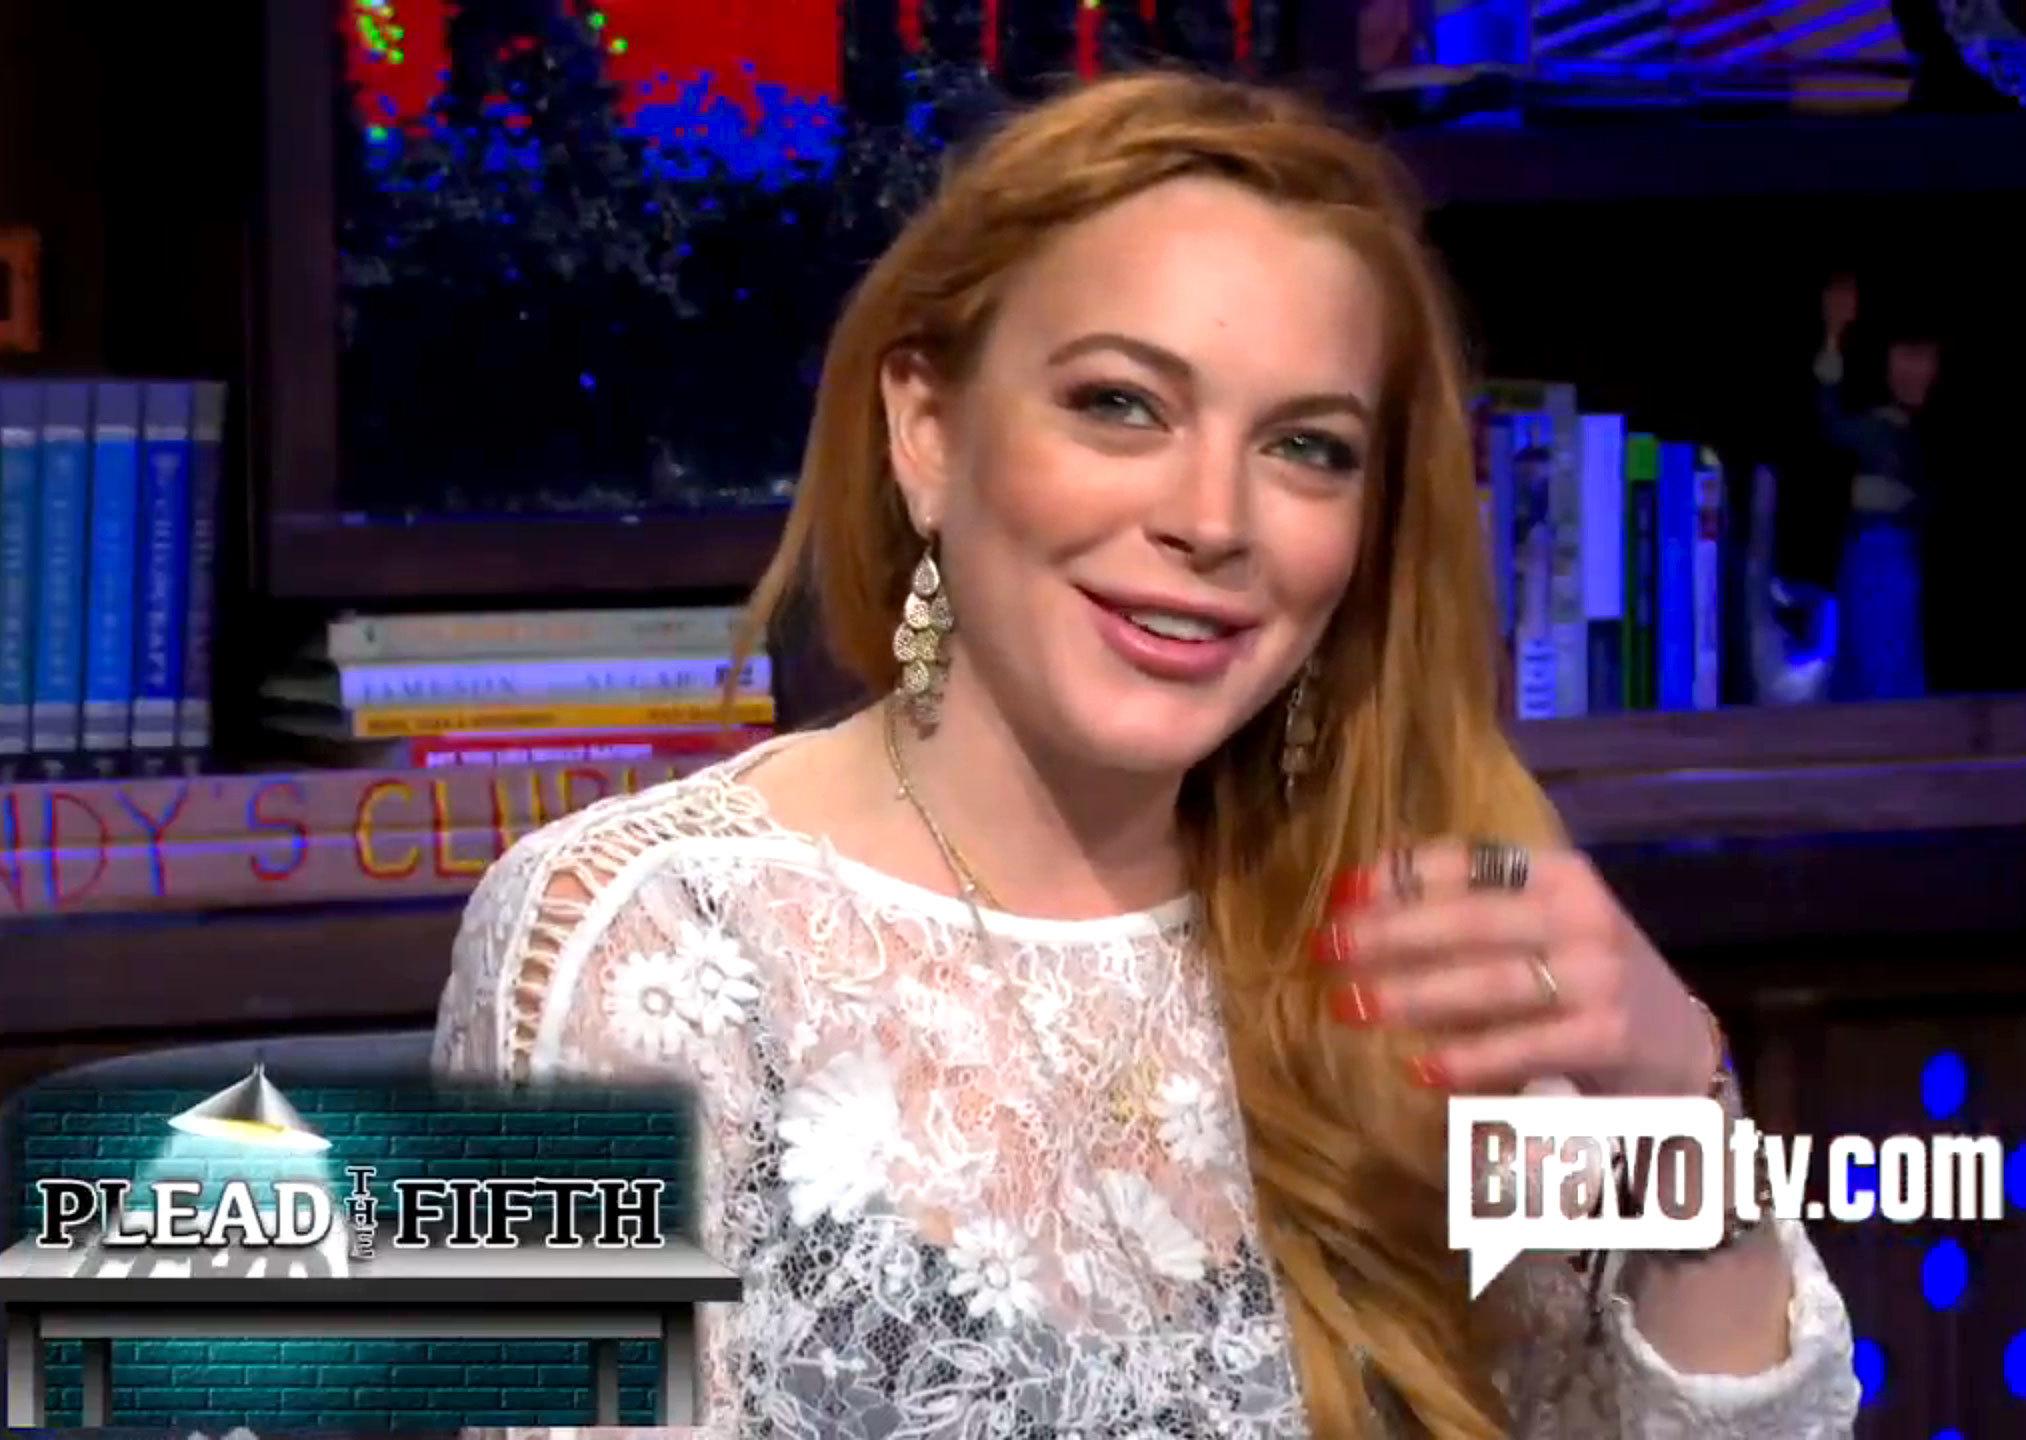 Lindsay Lohan Watch What Happens Live